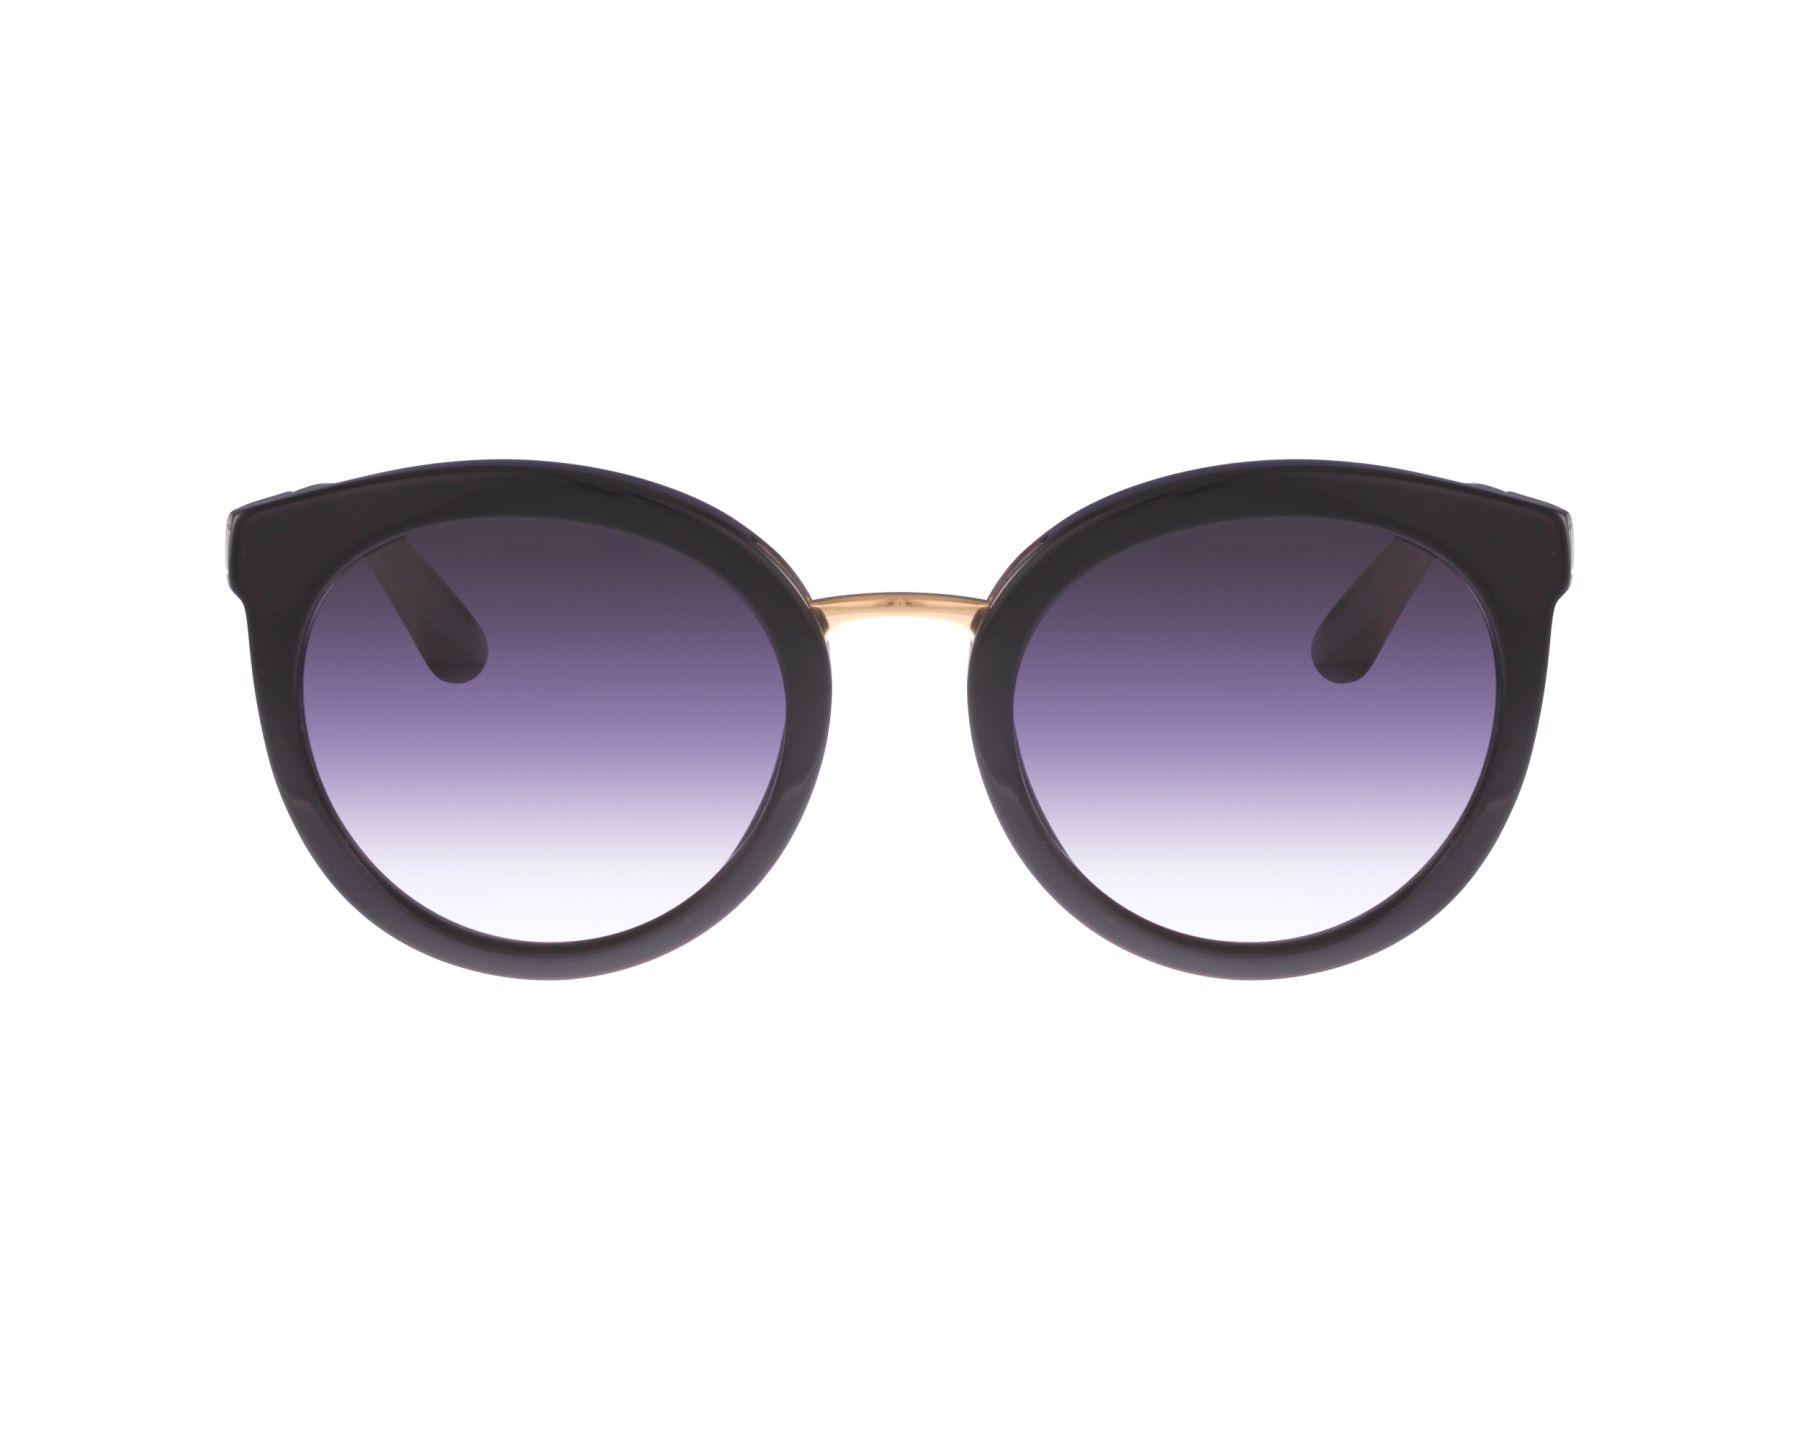 e03ca0c12d0 Sunglasses Dolce   Gabbana DG-4268 501 8G 52-22 Black Gold profile